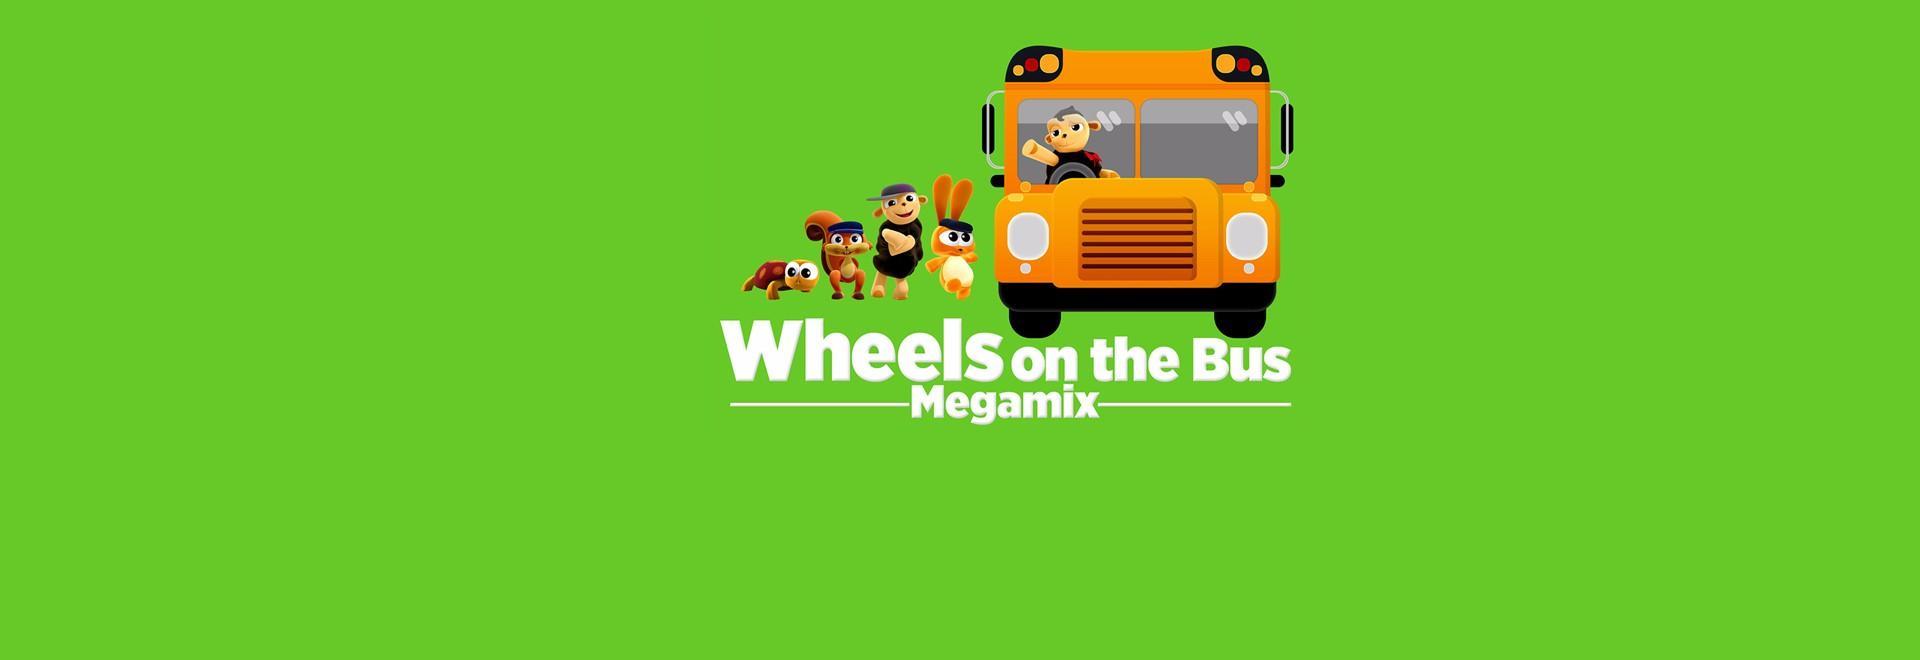 Megamix Wheels on the Bus